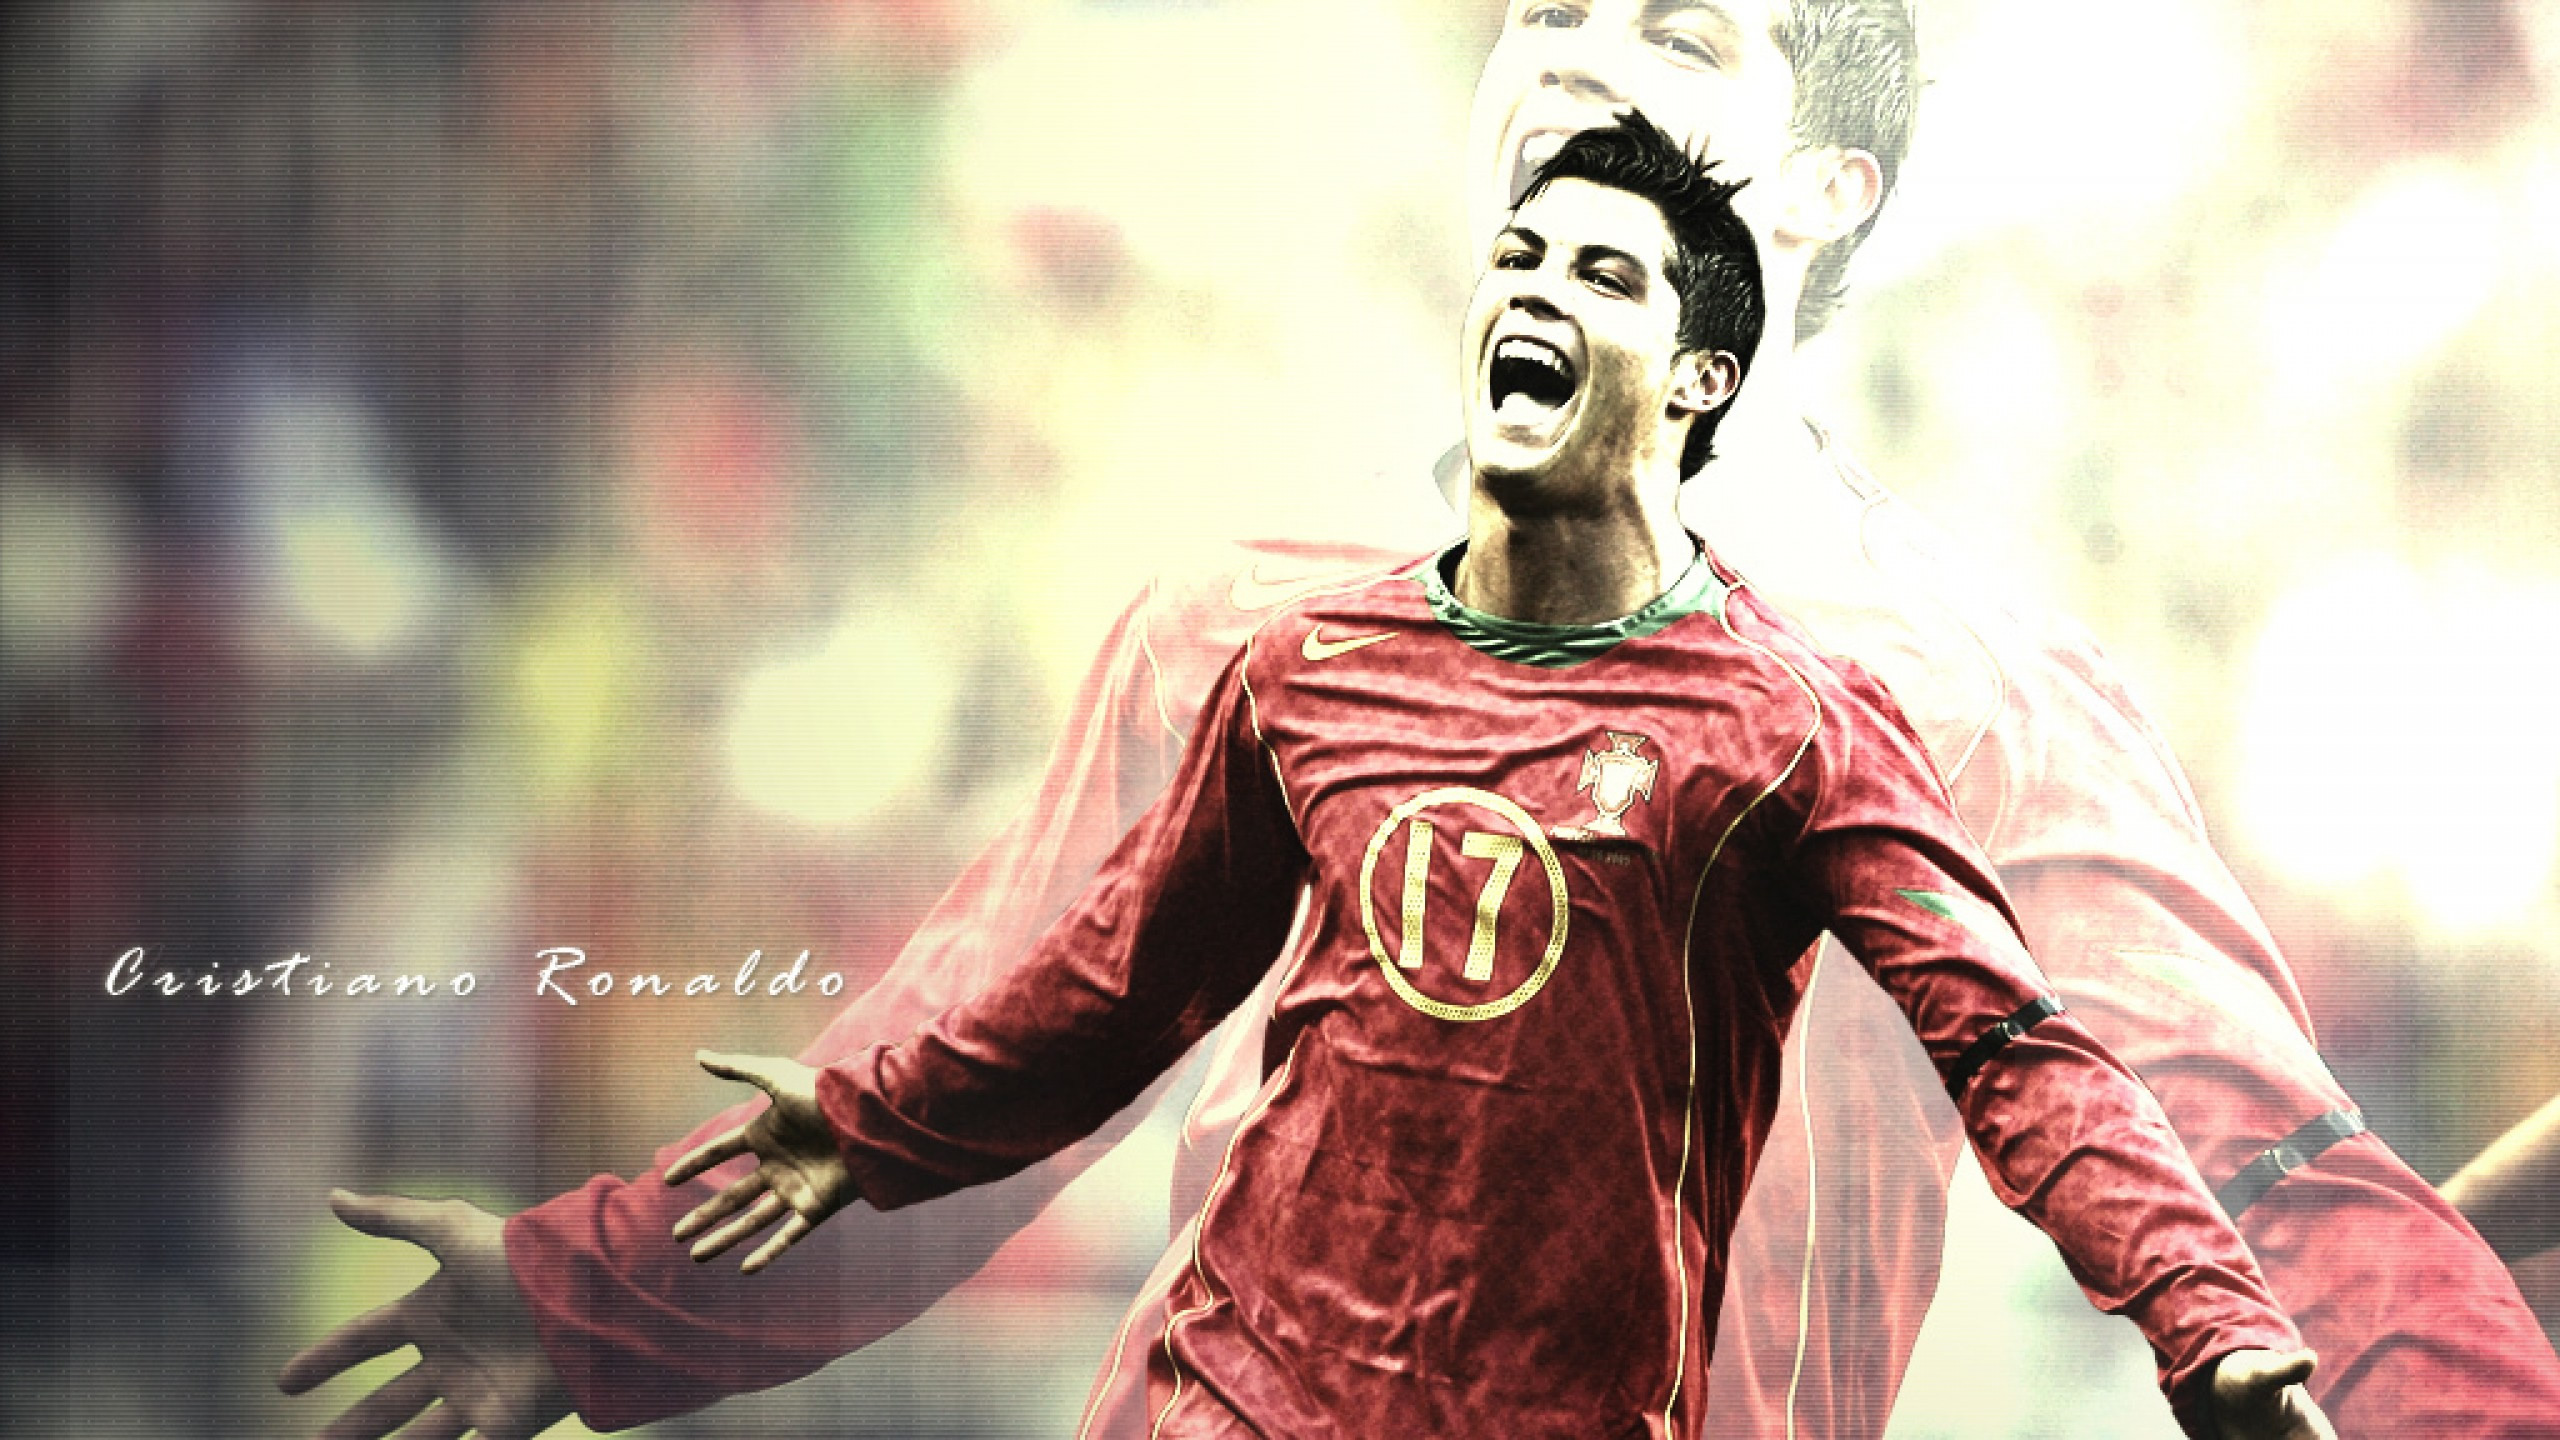 Cristiano Ronaldo running wallpaper (3)